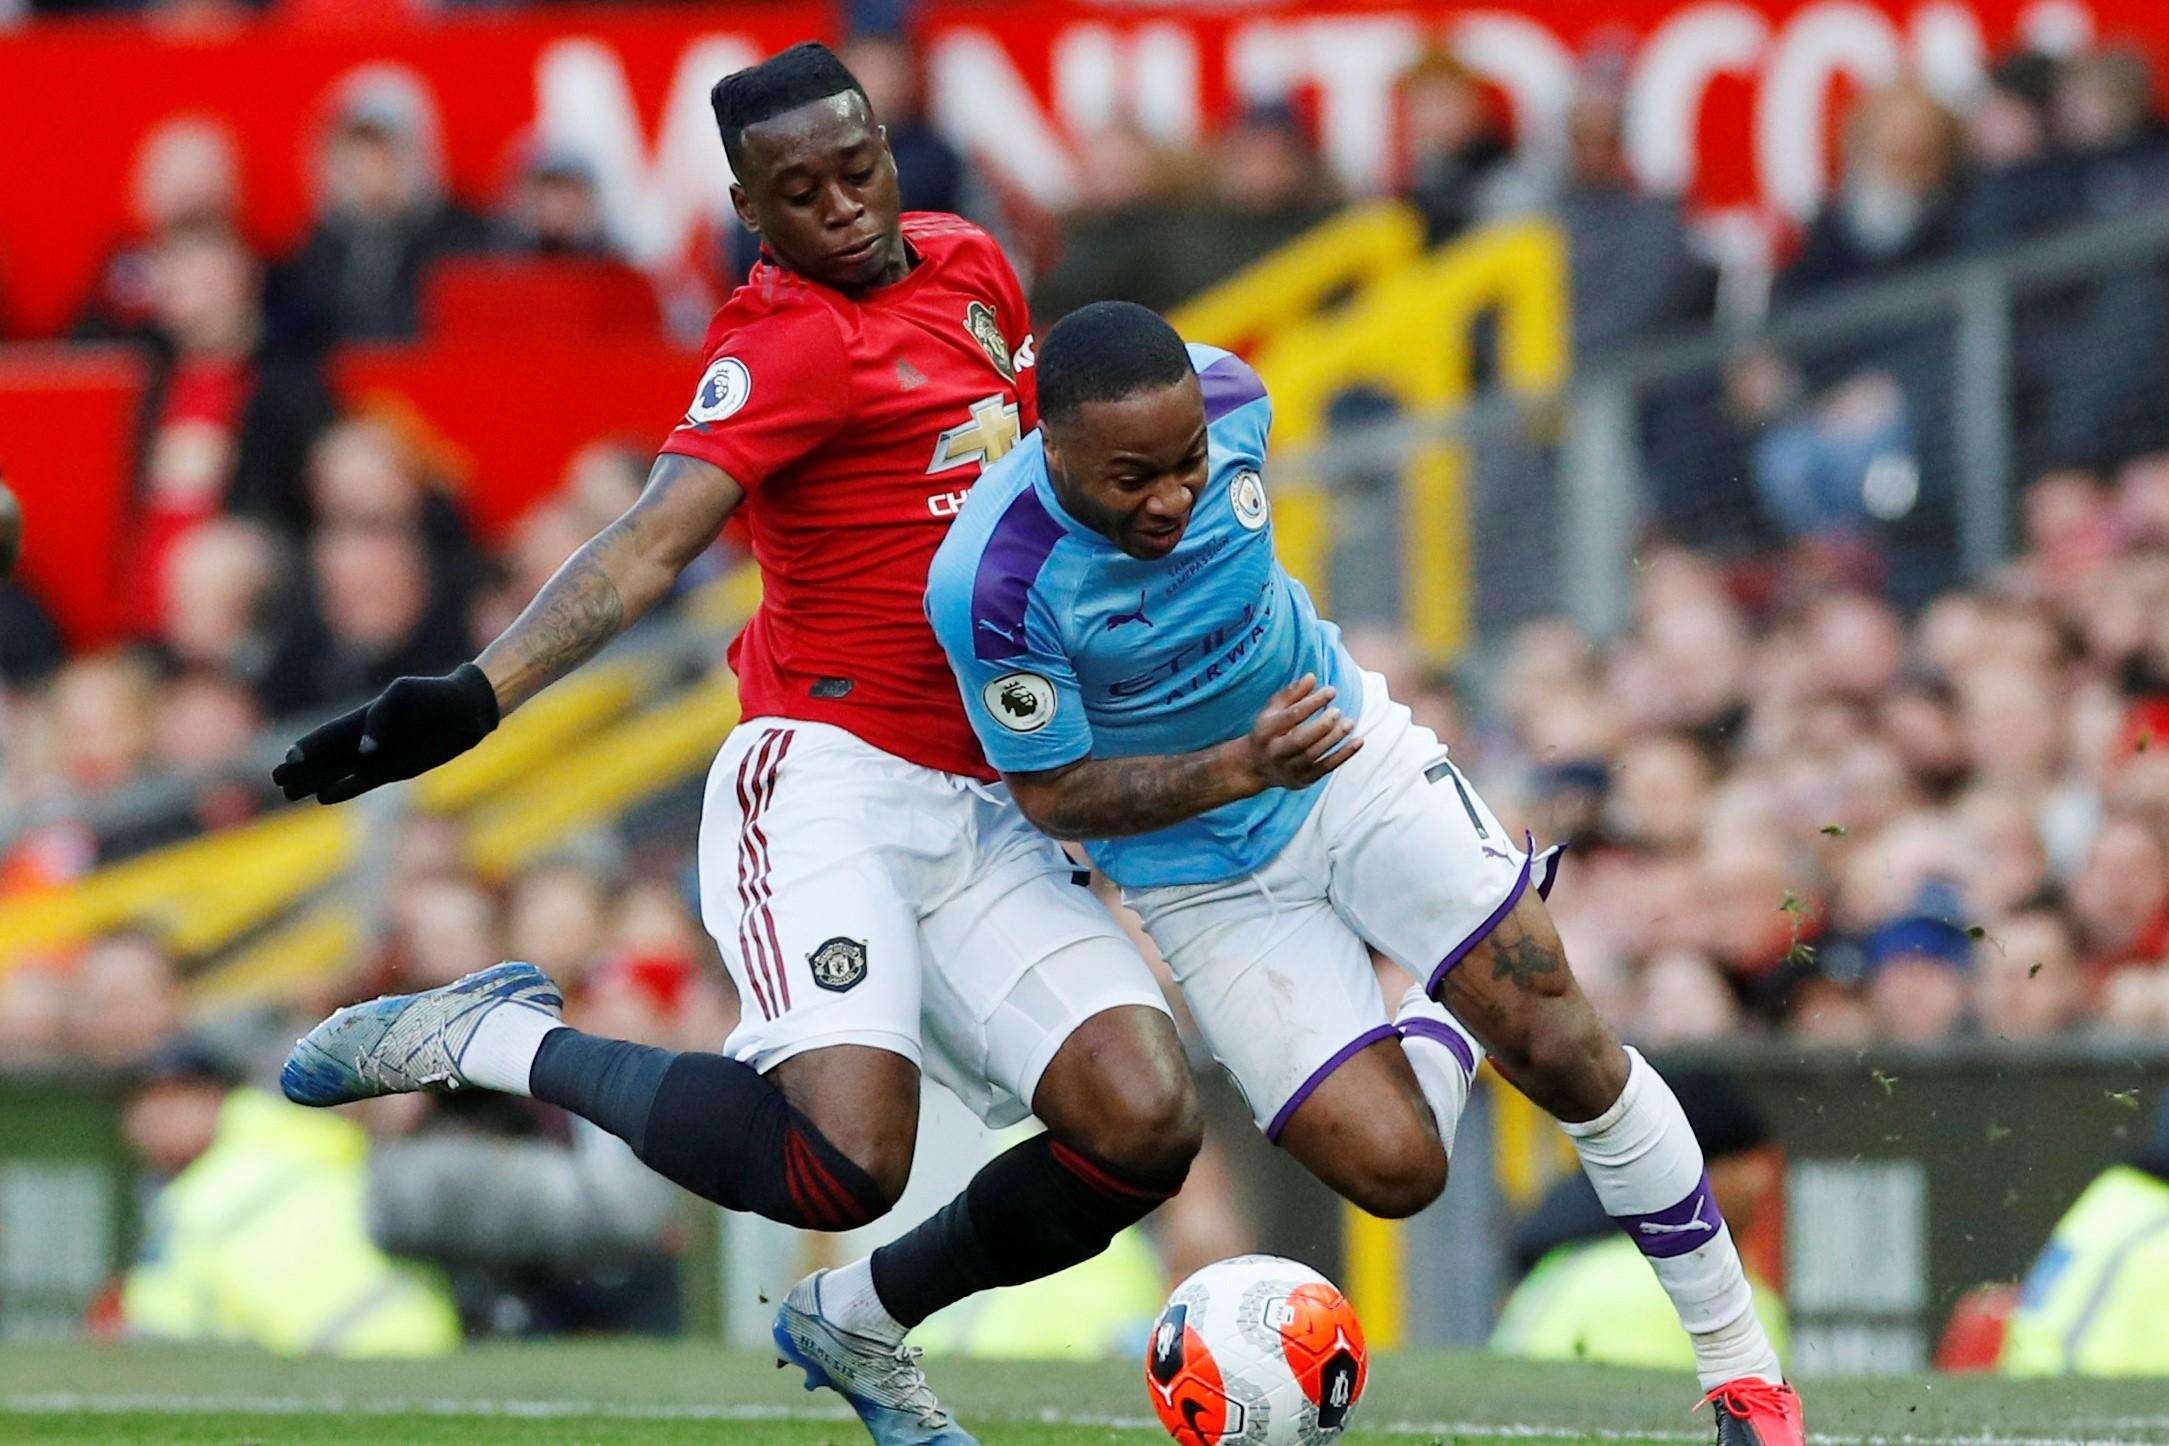 Shearer: Wan-Bissaka was dominant in derby